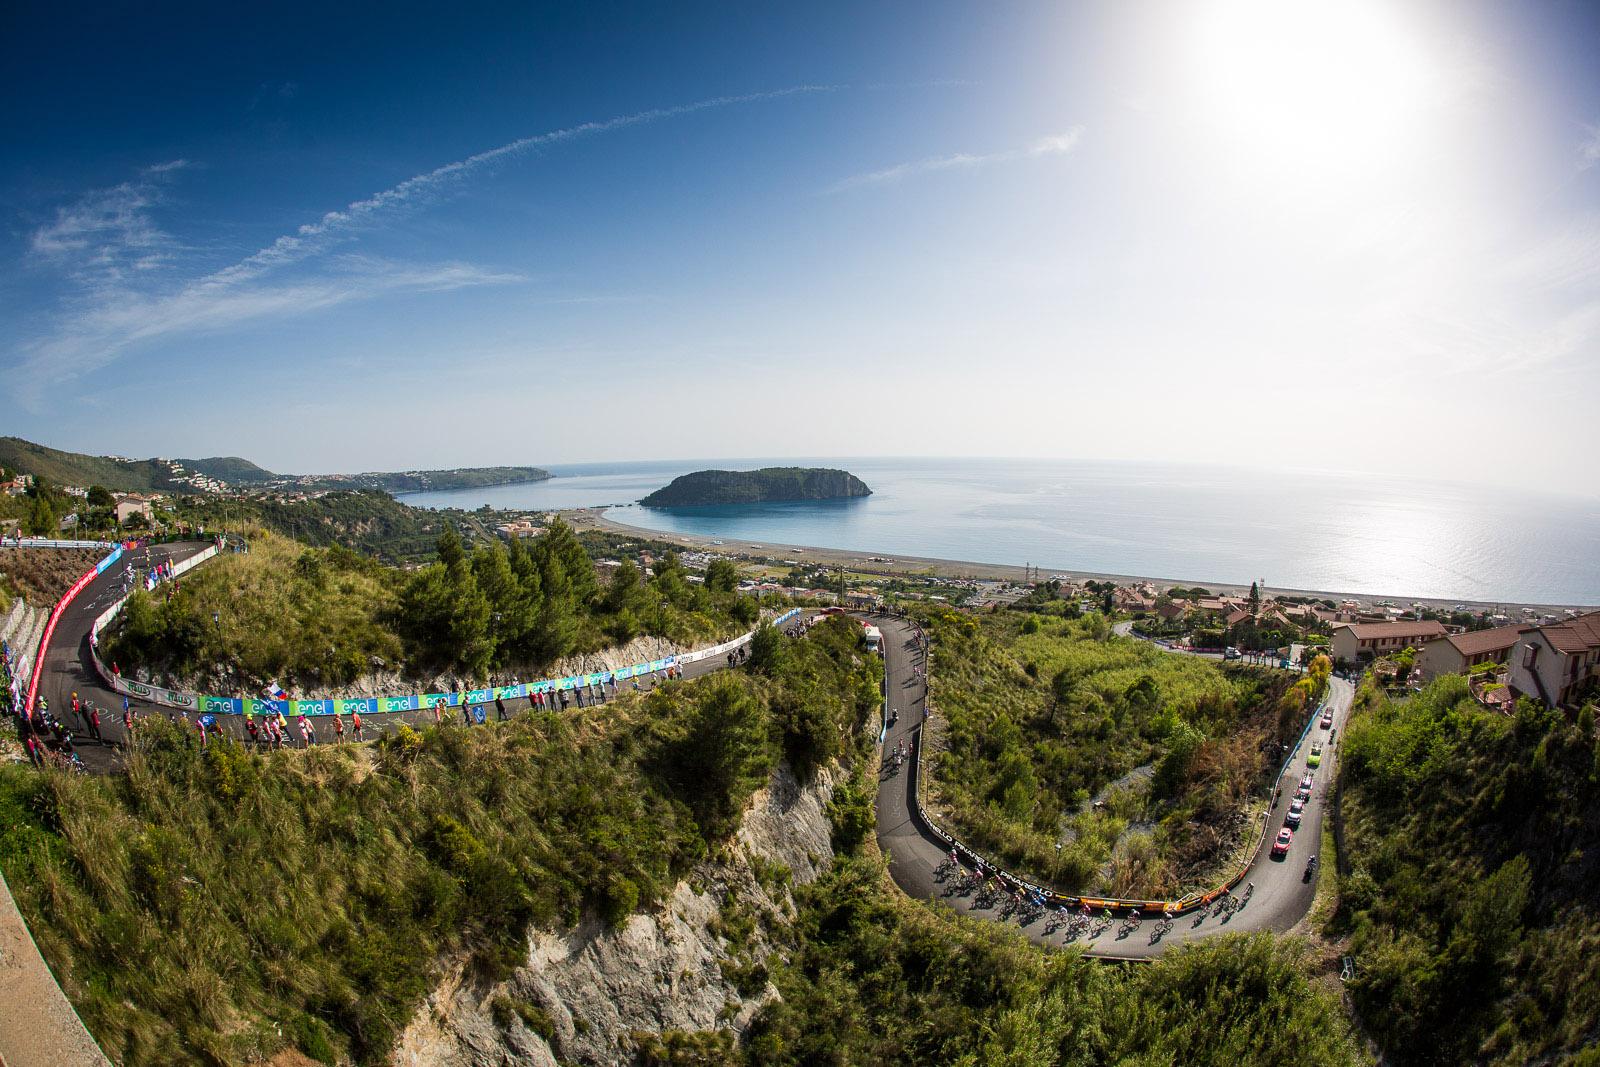 Praia a Mare - Panorama